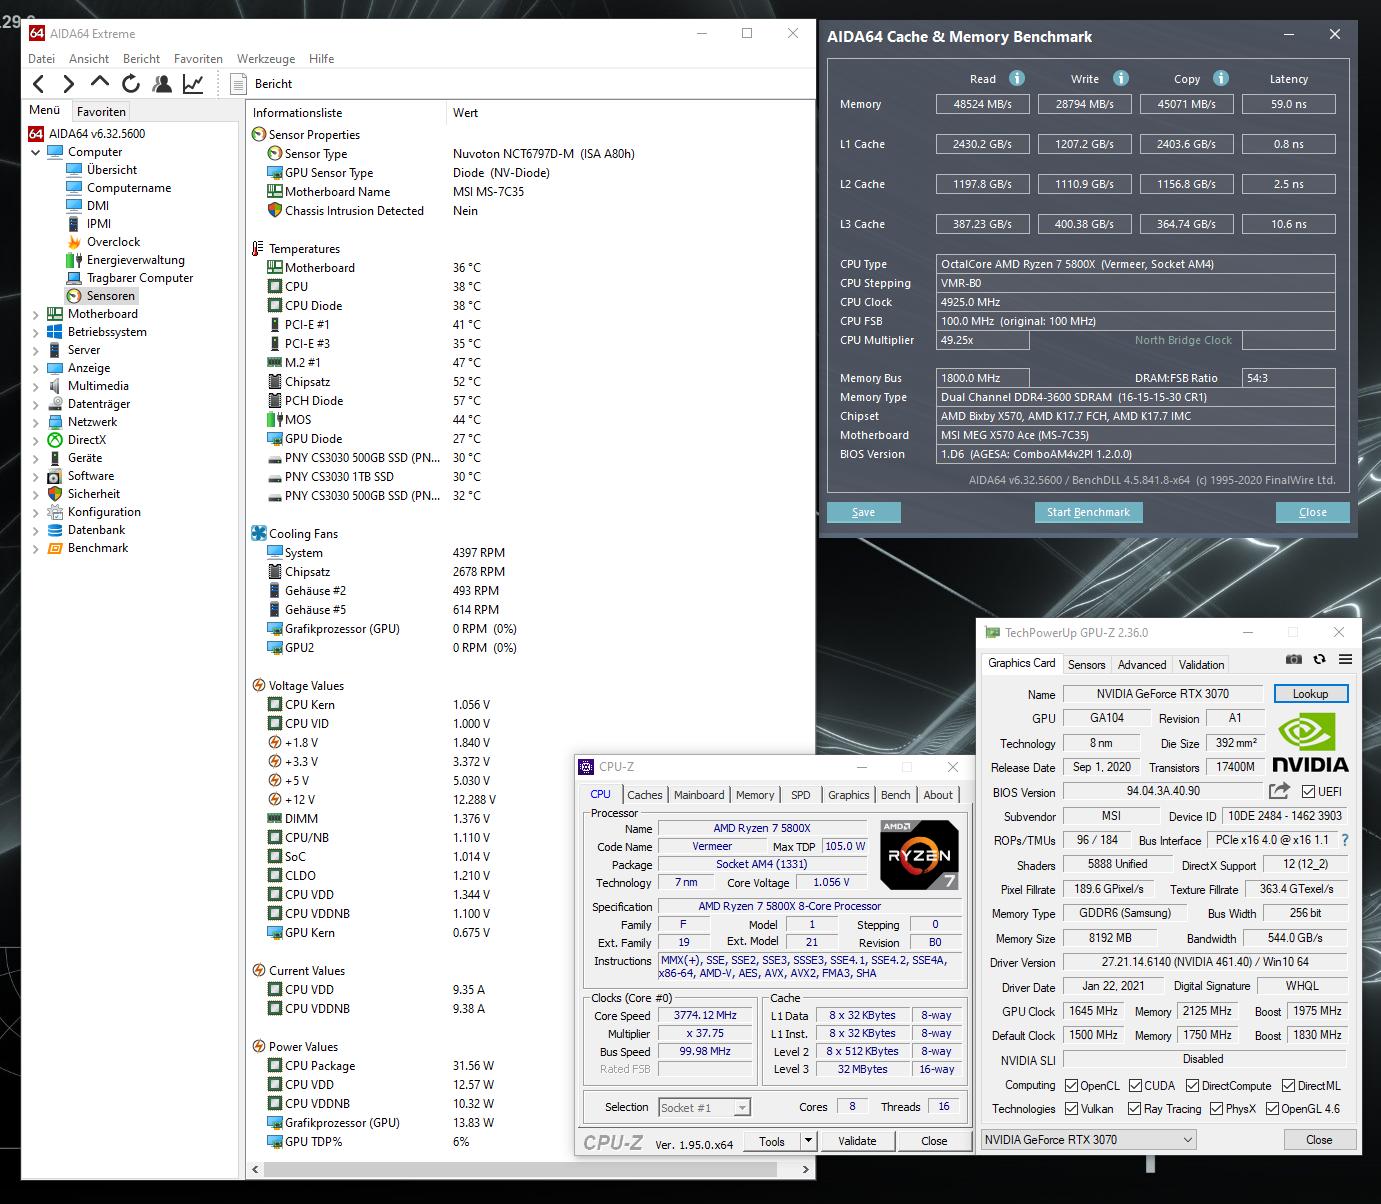 Screenshot 2021-02-05 150337.png